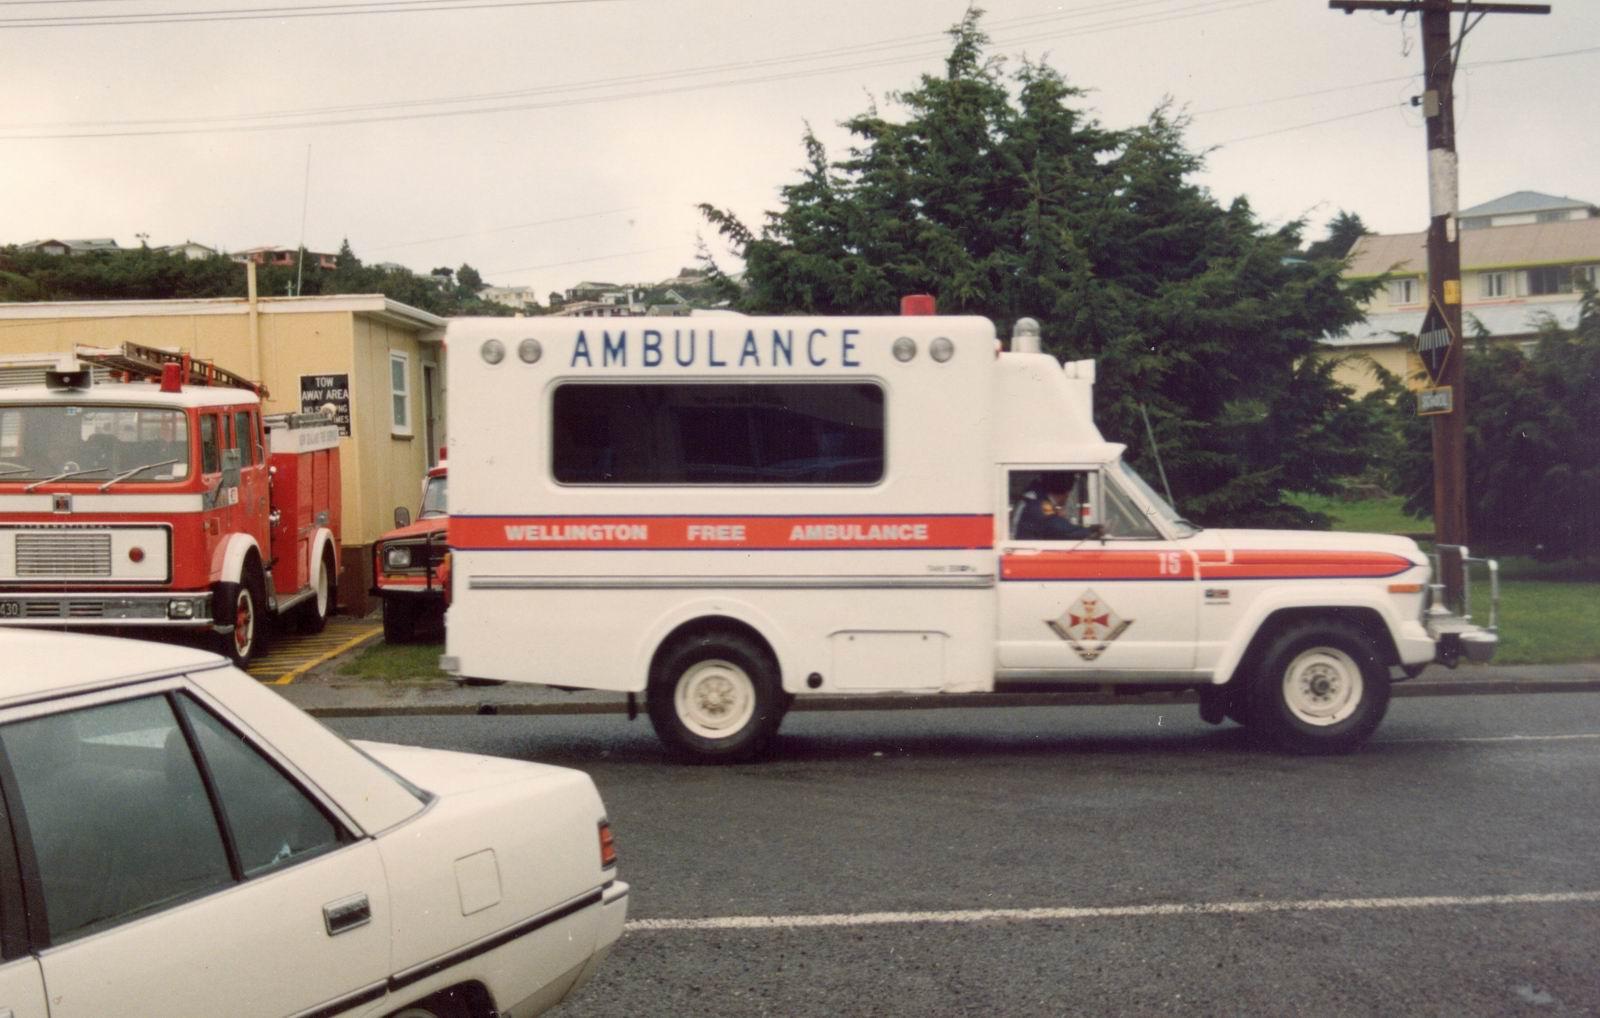 File Wellington Free Ambulance Jeep Flickr 111 Emergency 1 Jpg Wikimedia Commons